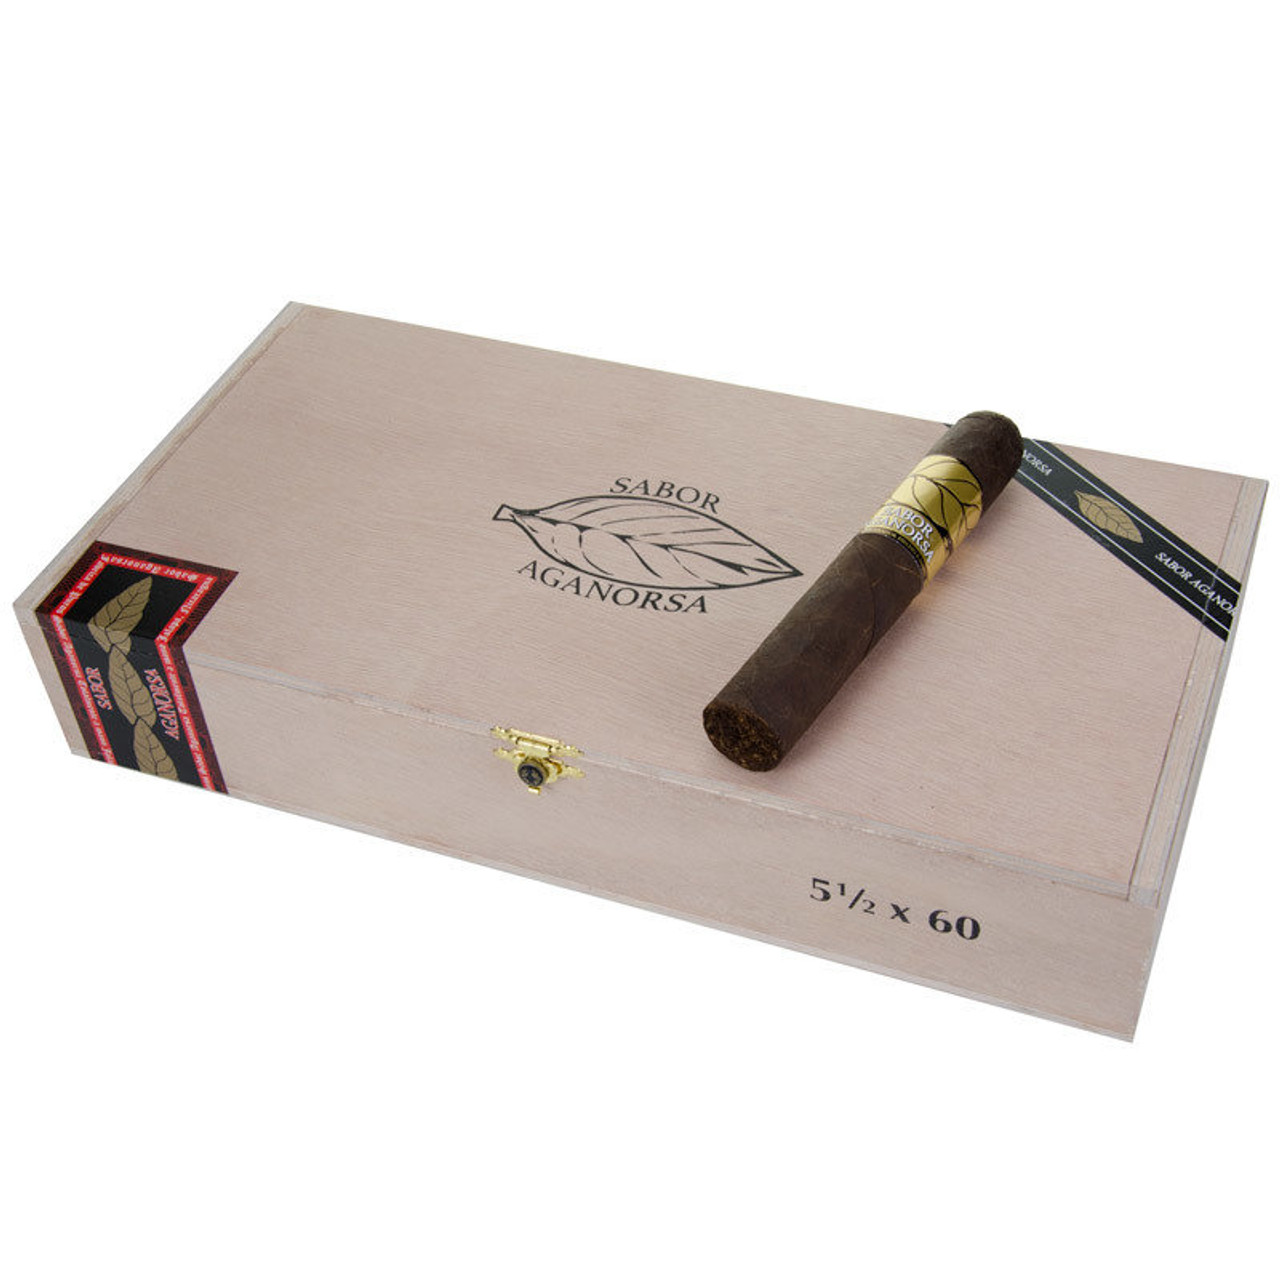 Casa Fernandez Sabor Aganorsa Titan Maduro Cigars